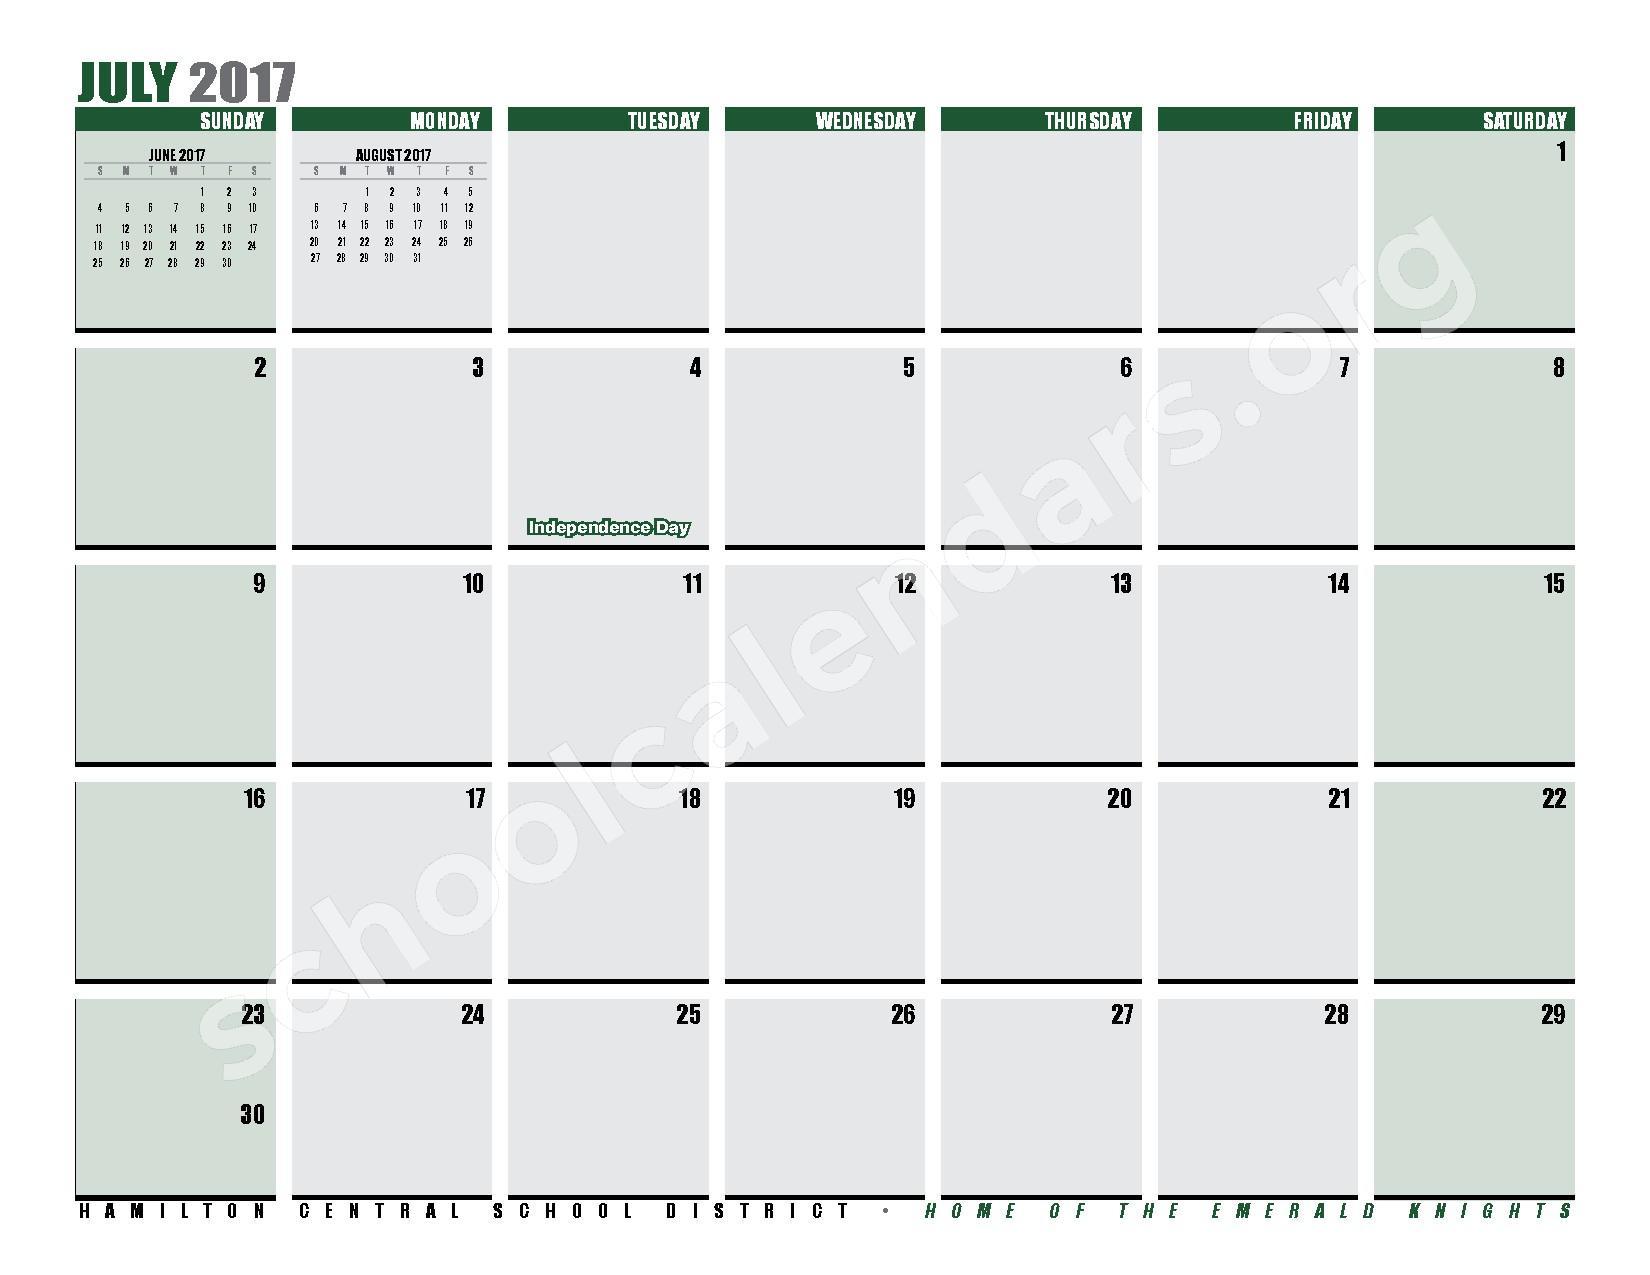 2016 - 2017 District Calendar – Hamilton Central School District – page 29